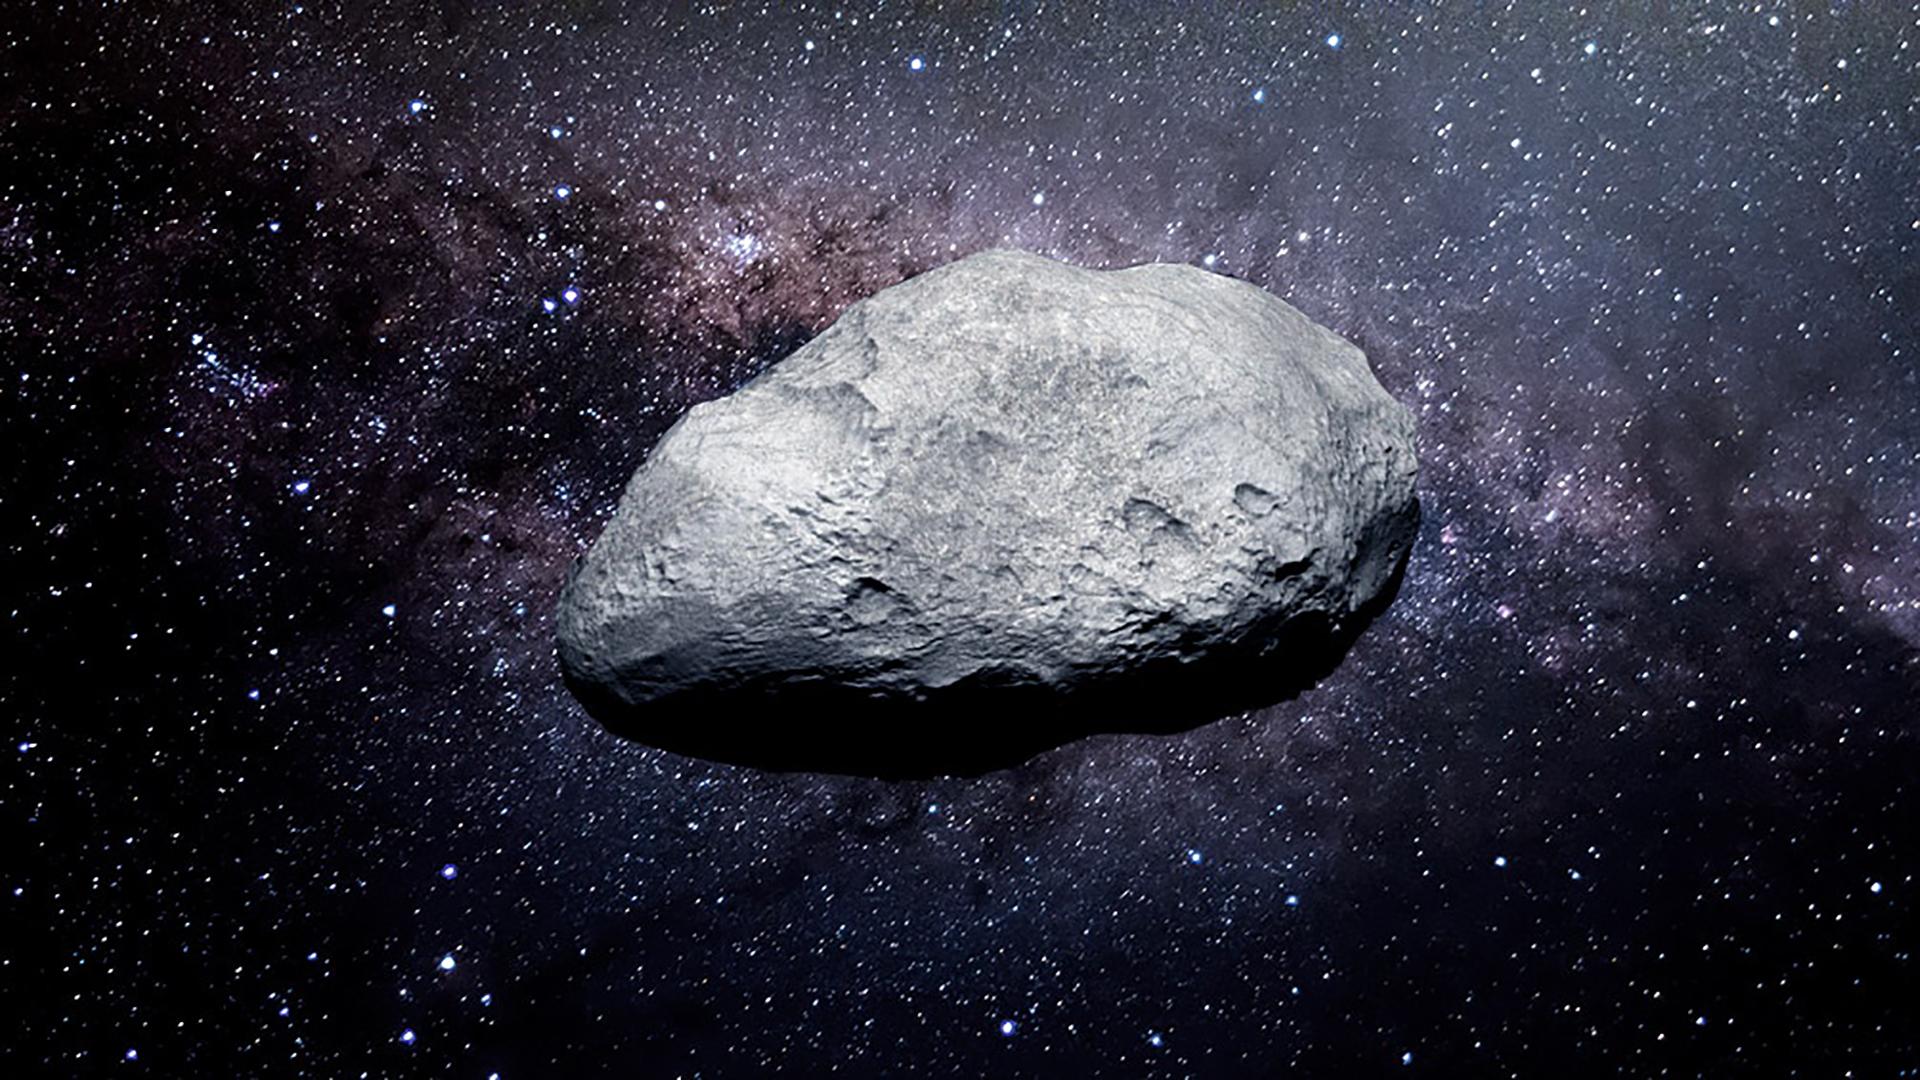 asteroid hurtl cnn programs - HD1920×1080